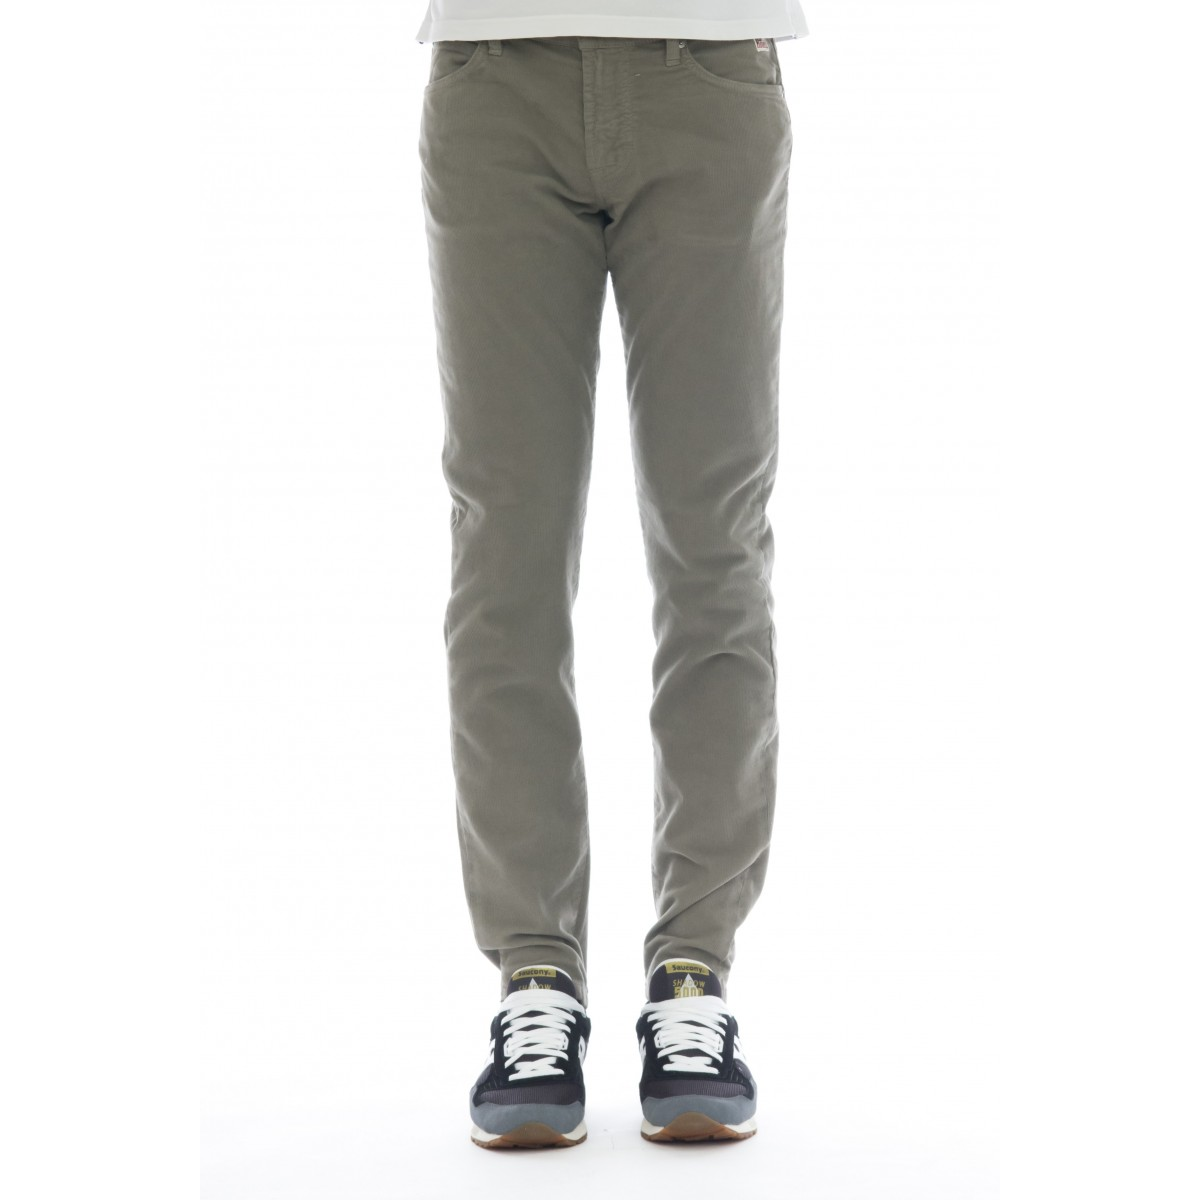 Pantalone uomo - 517 velluto